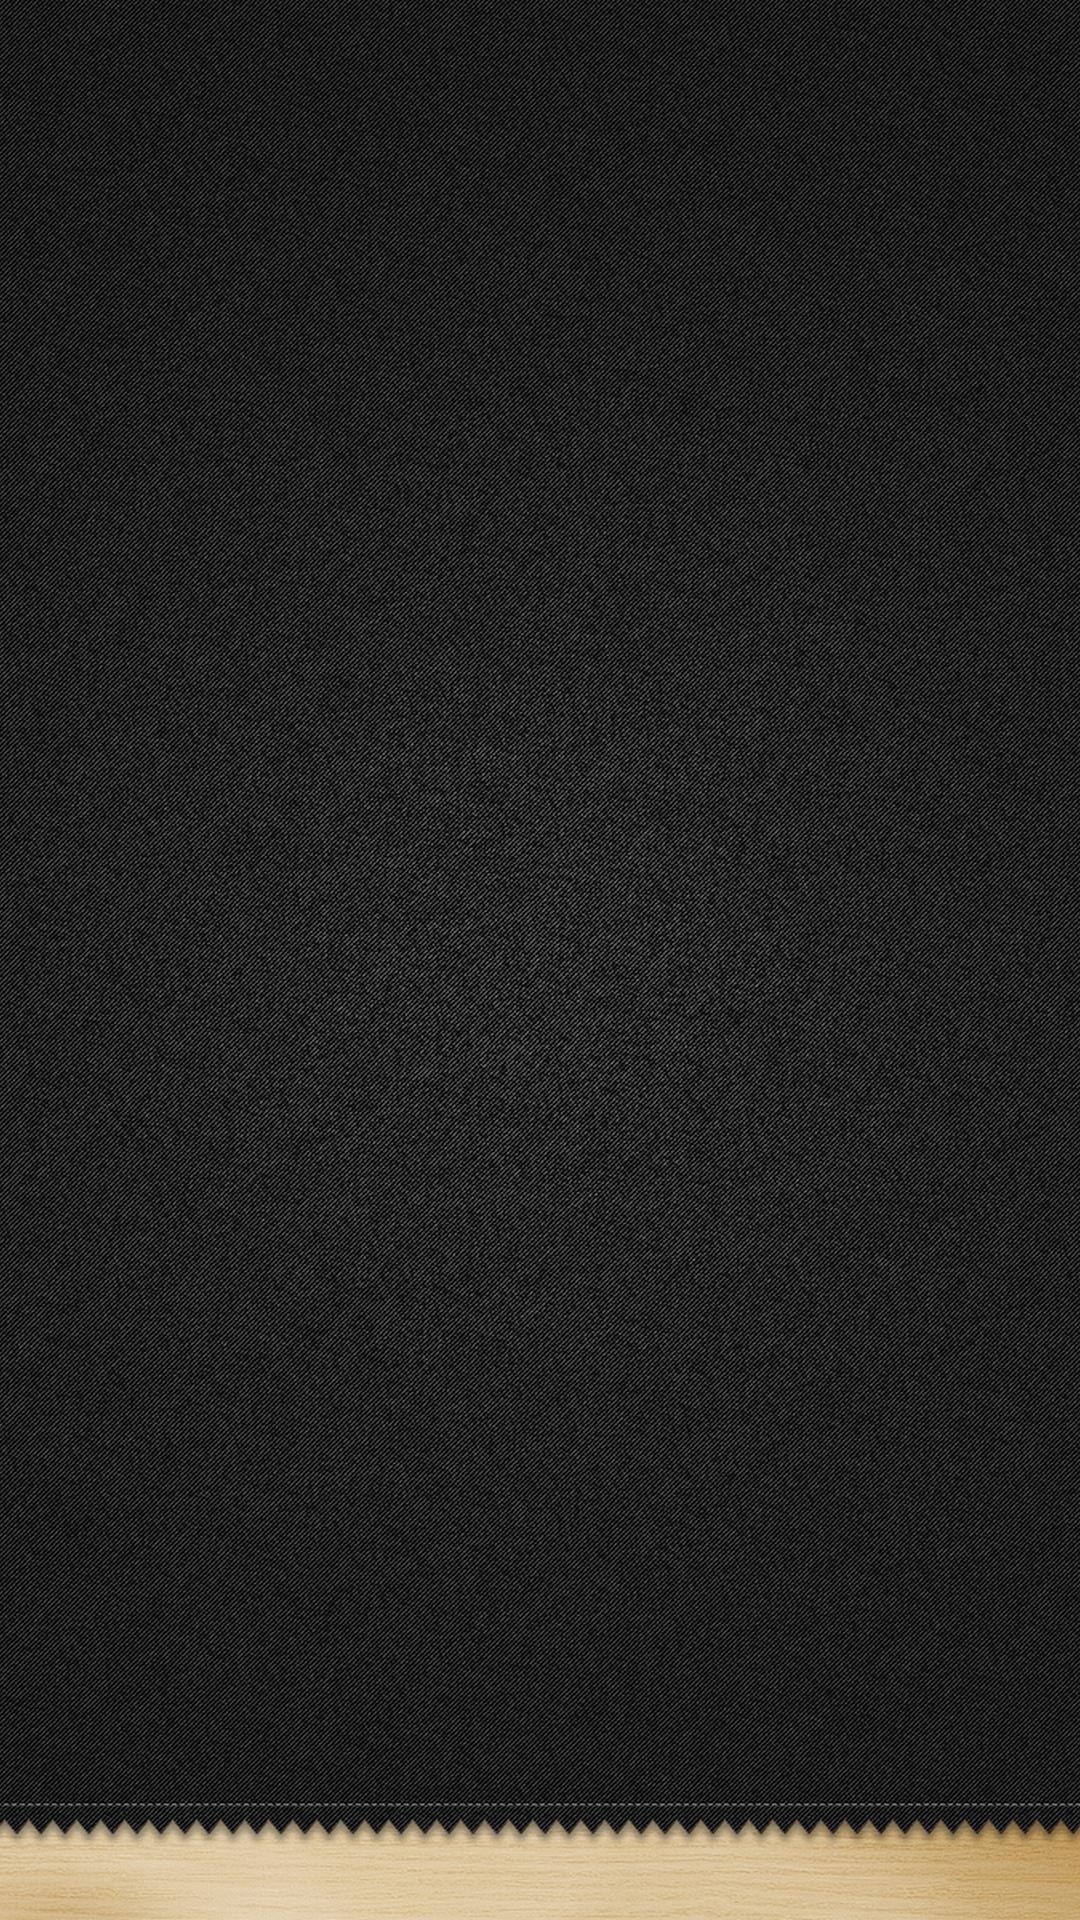 Clean Dark Denim Texture Android Wallpaper download 1080x1920